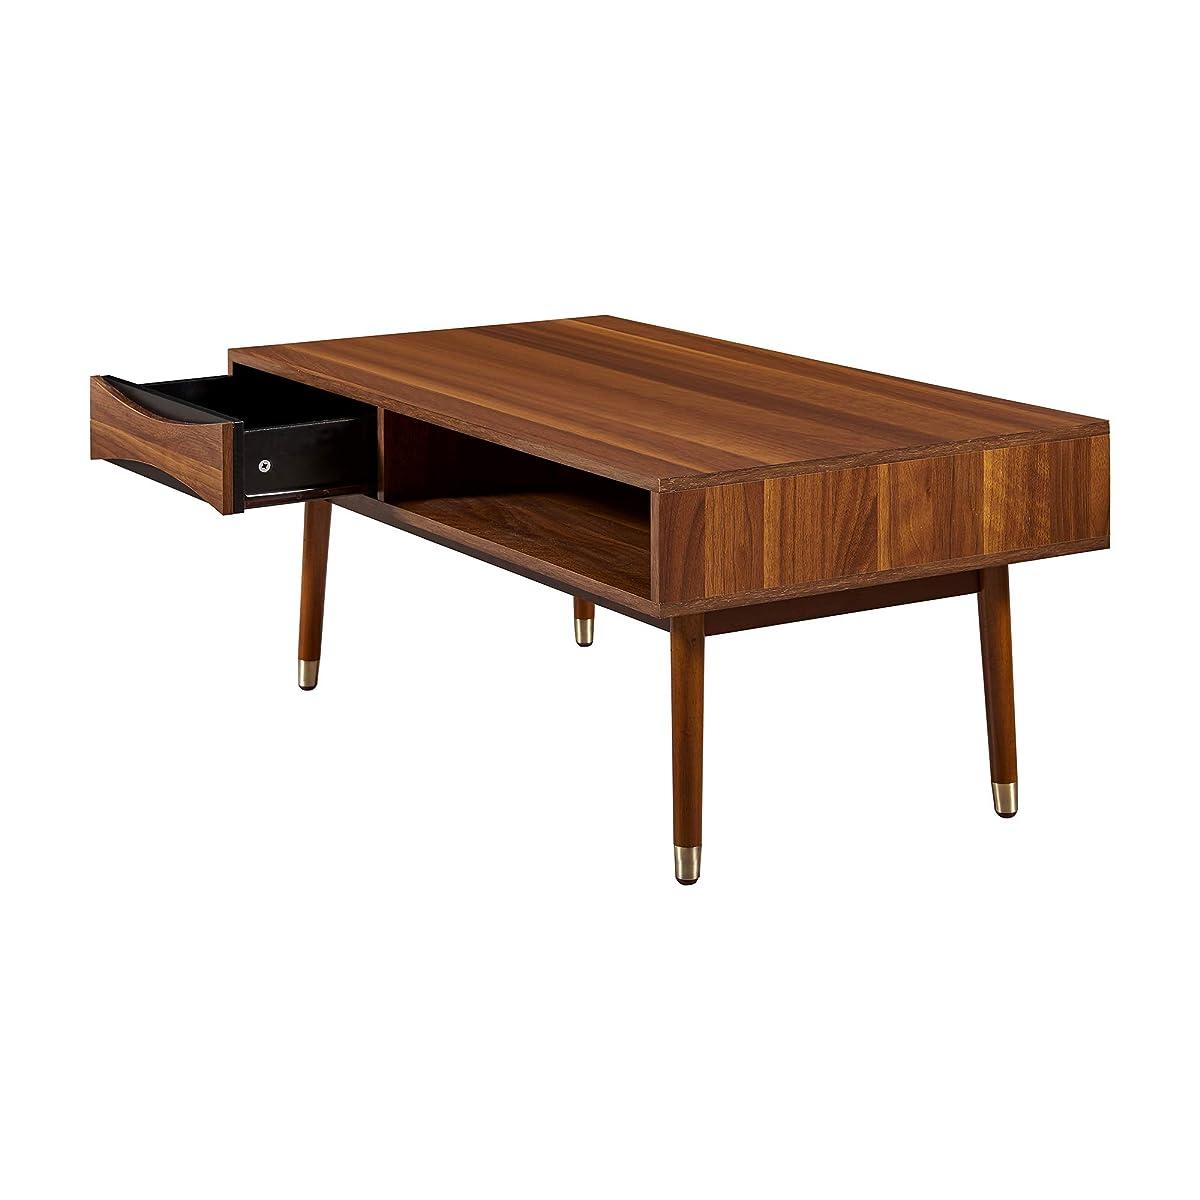 "Versanora VNF-00065 Dawson Coffee Table | Living Room 39.62"" x 21.62"" x 17.75"" Walnut"